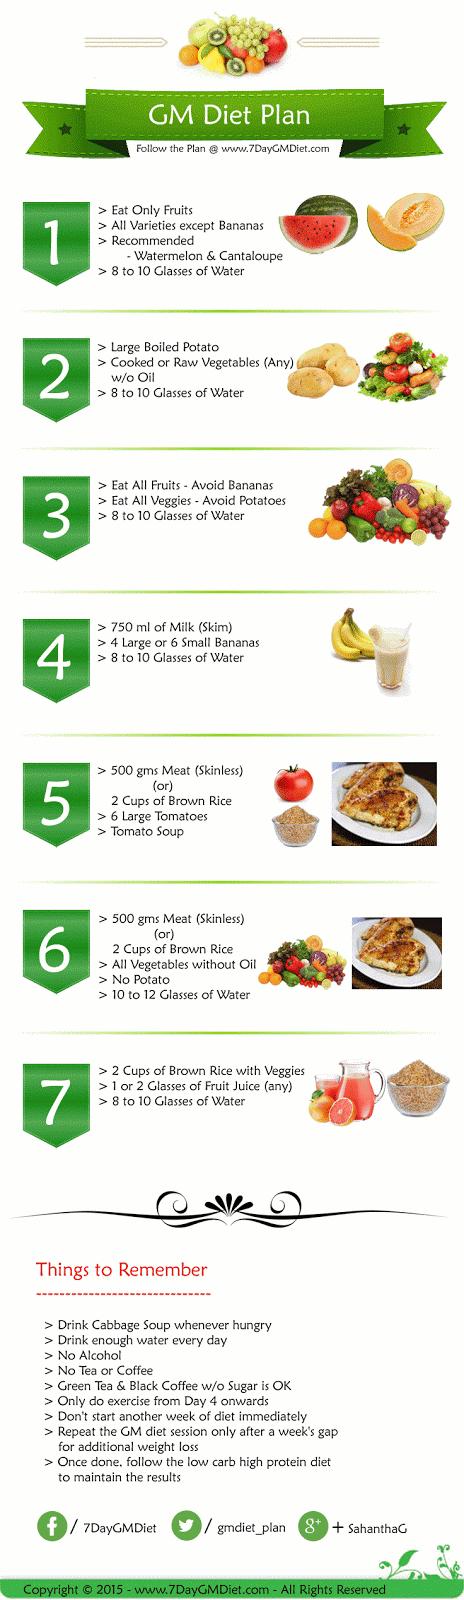 Gm Diet Plan Reviews Benefits Drawbacks Meal Plan